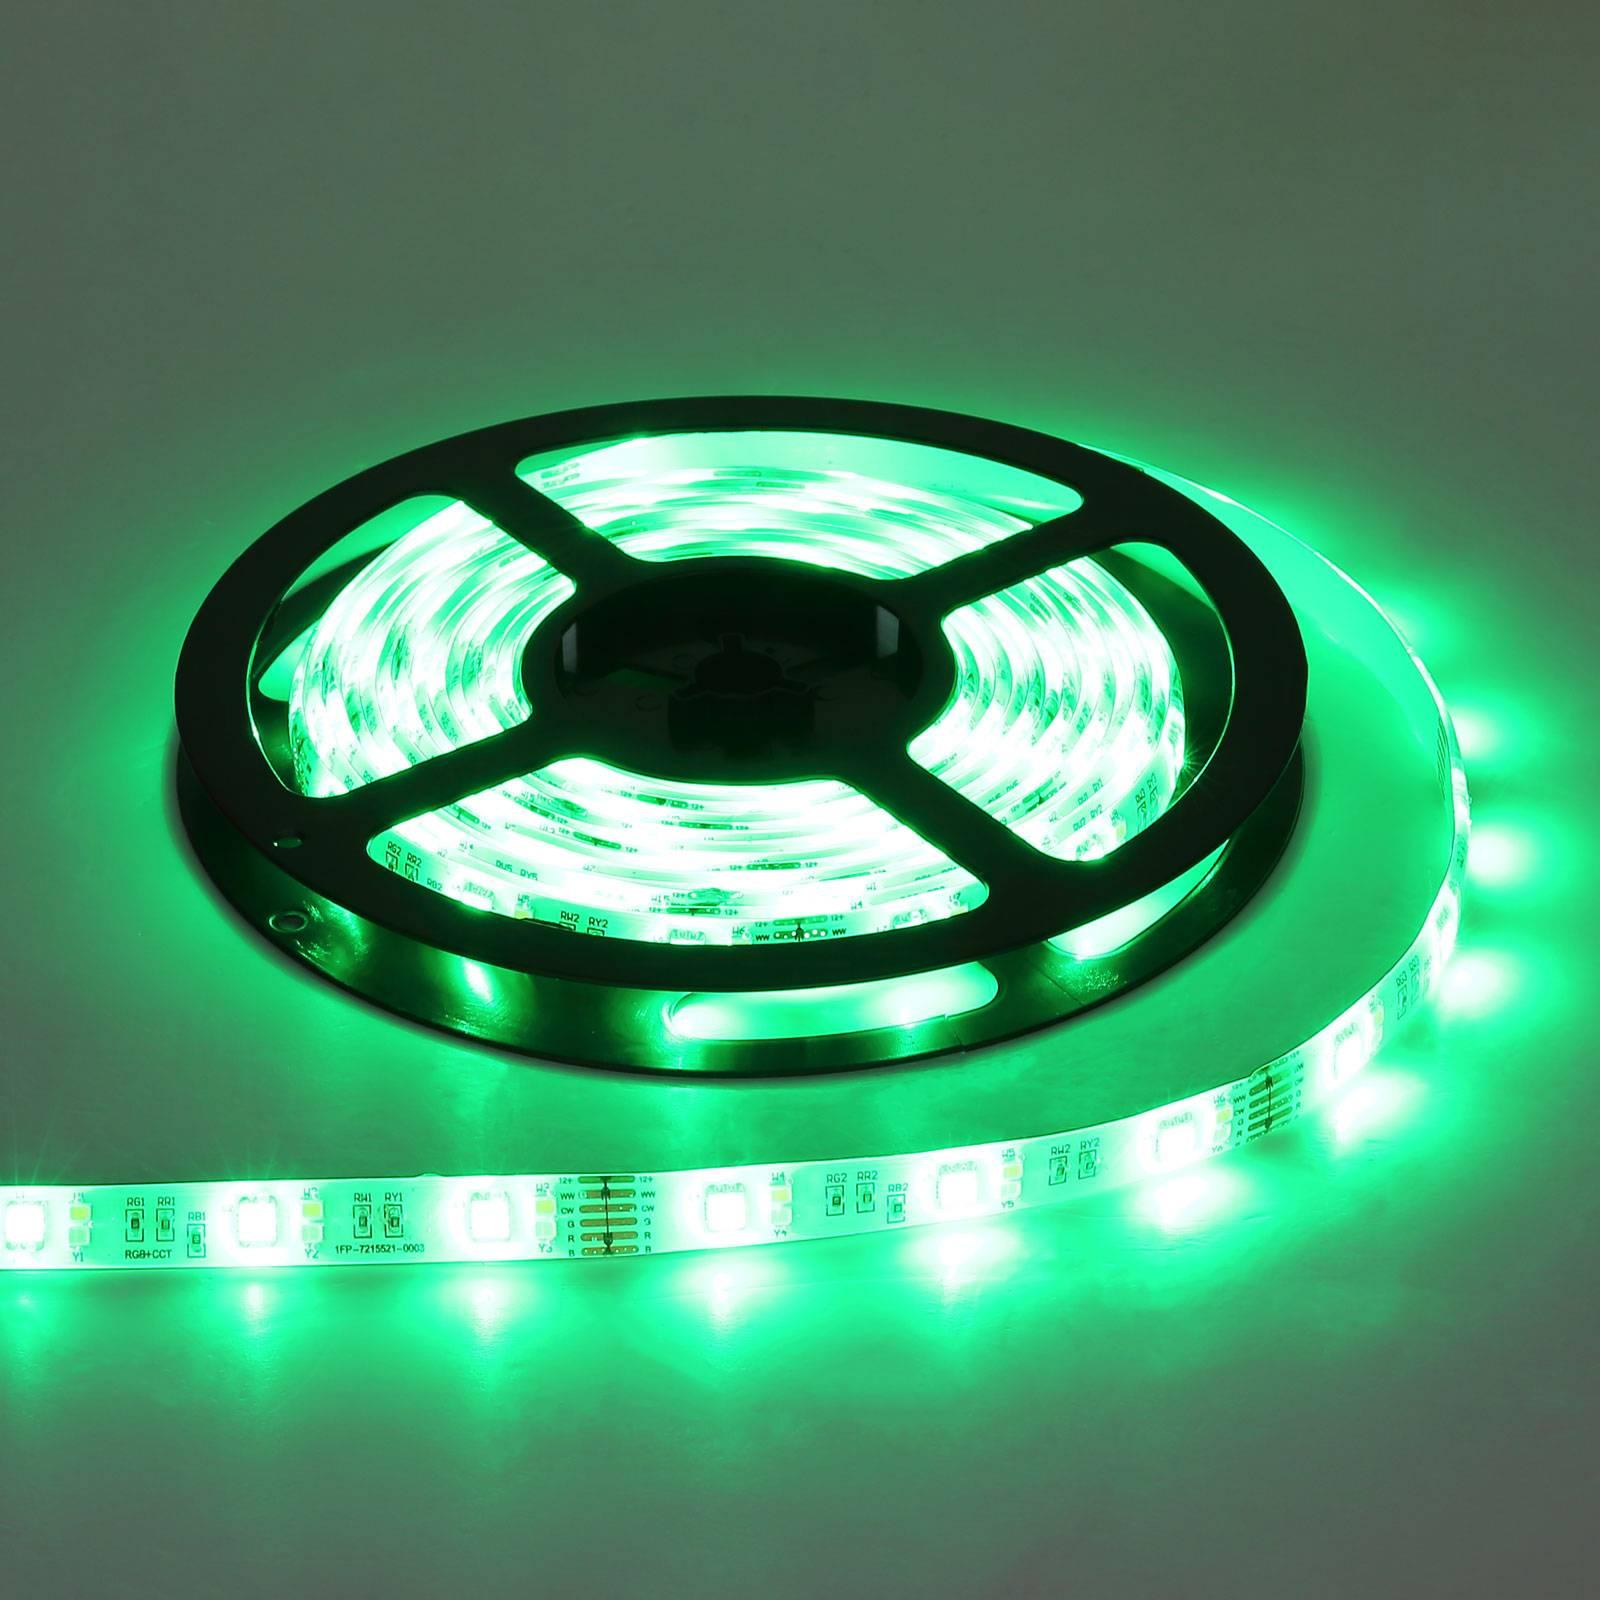 LED-nauha Eduard Tuya-Smart RGBW CCT kaukosäädin